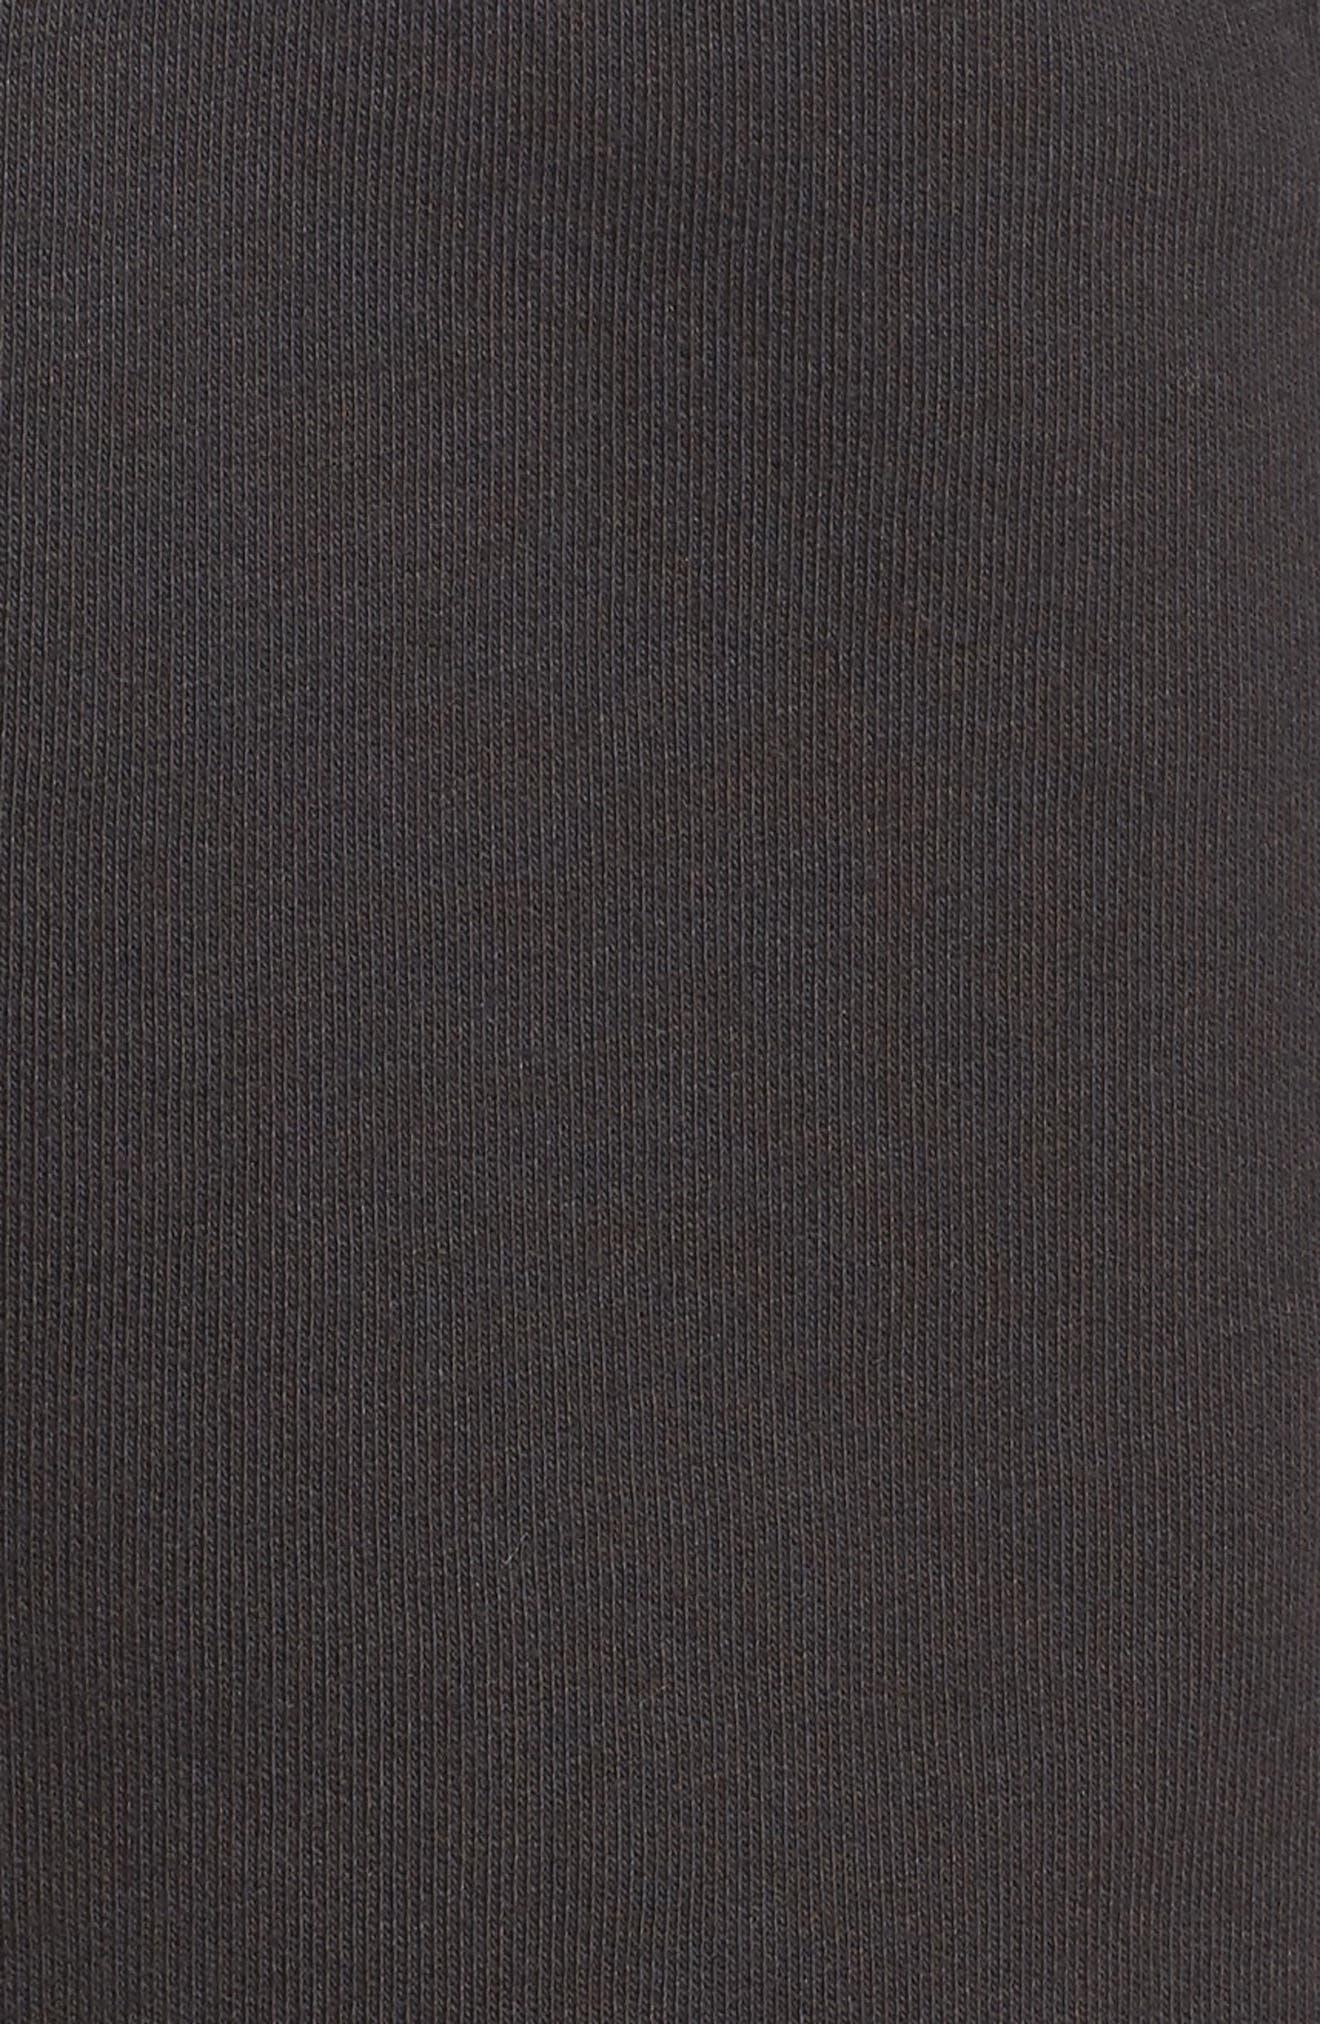 Lounge Shorts,                             Alternate thumbnail 5, color,                             001